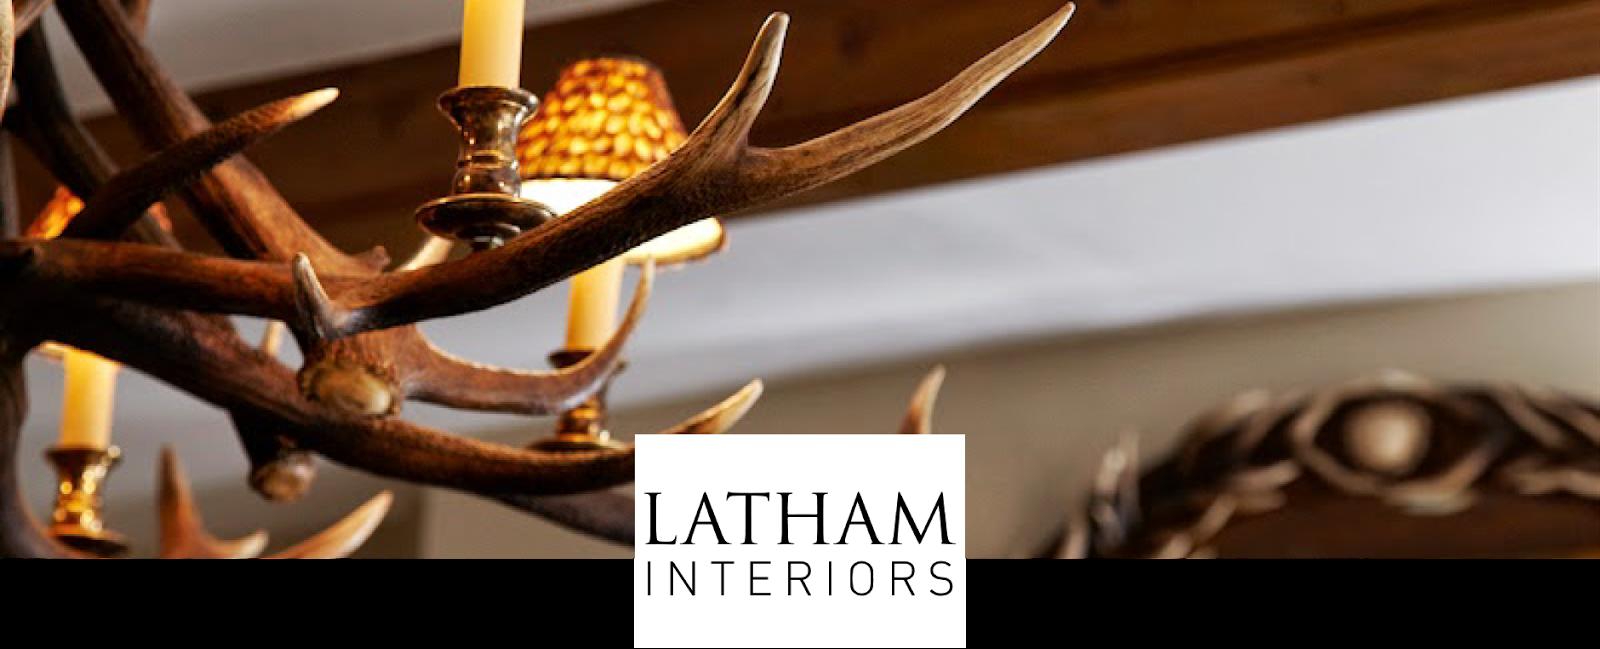 Latham Interiors